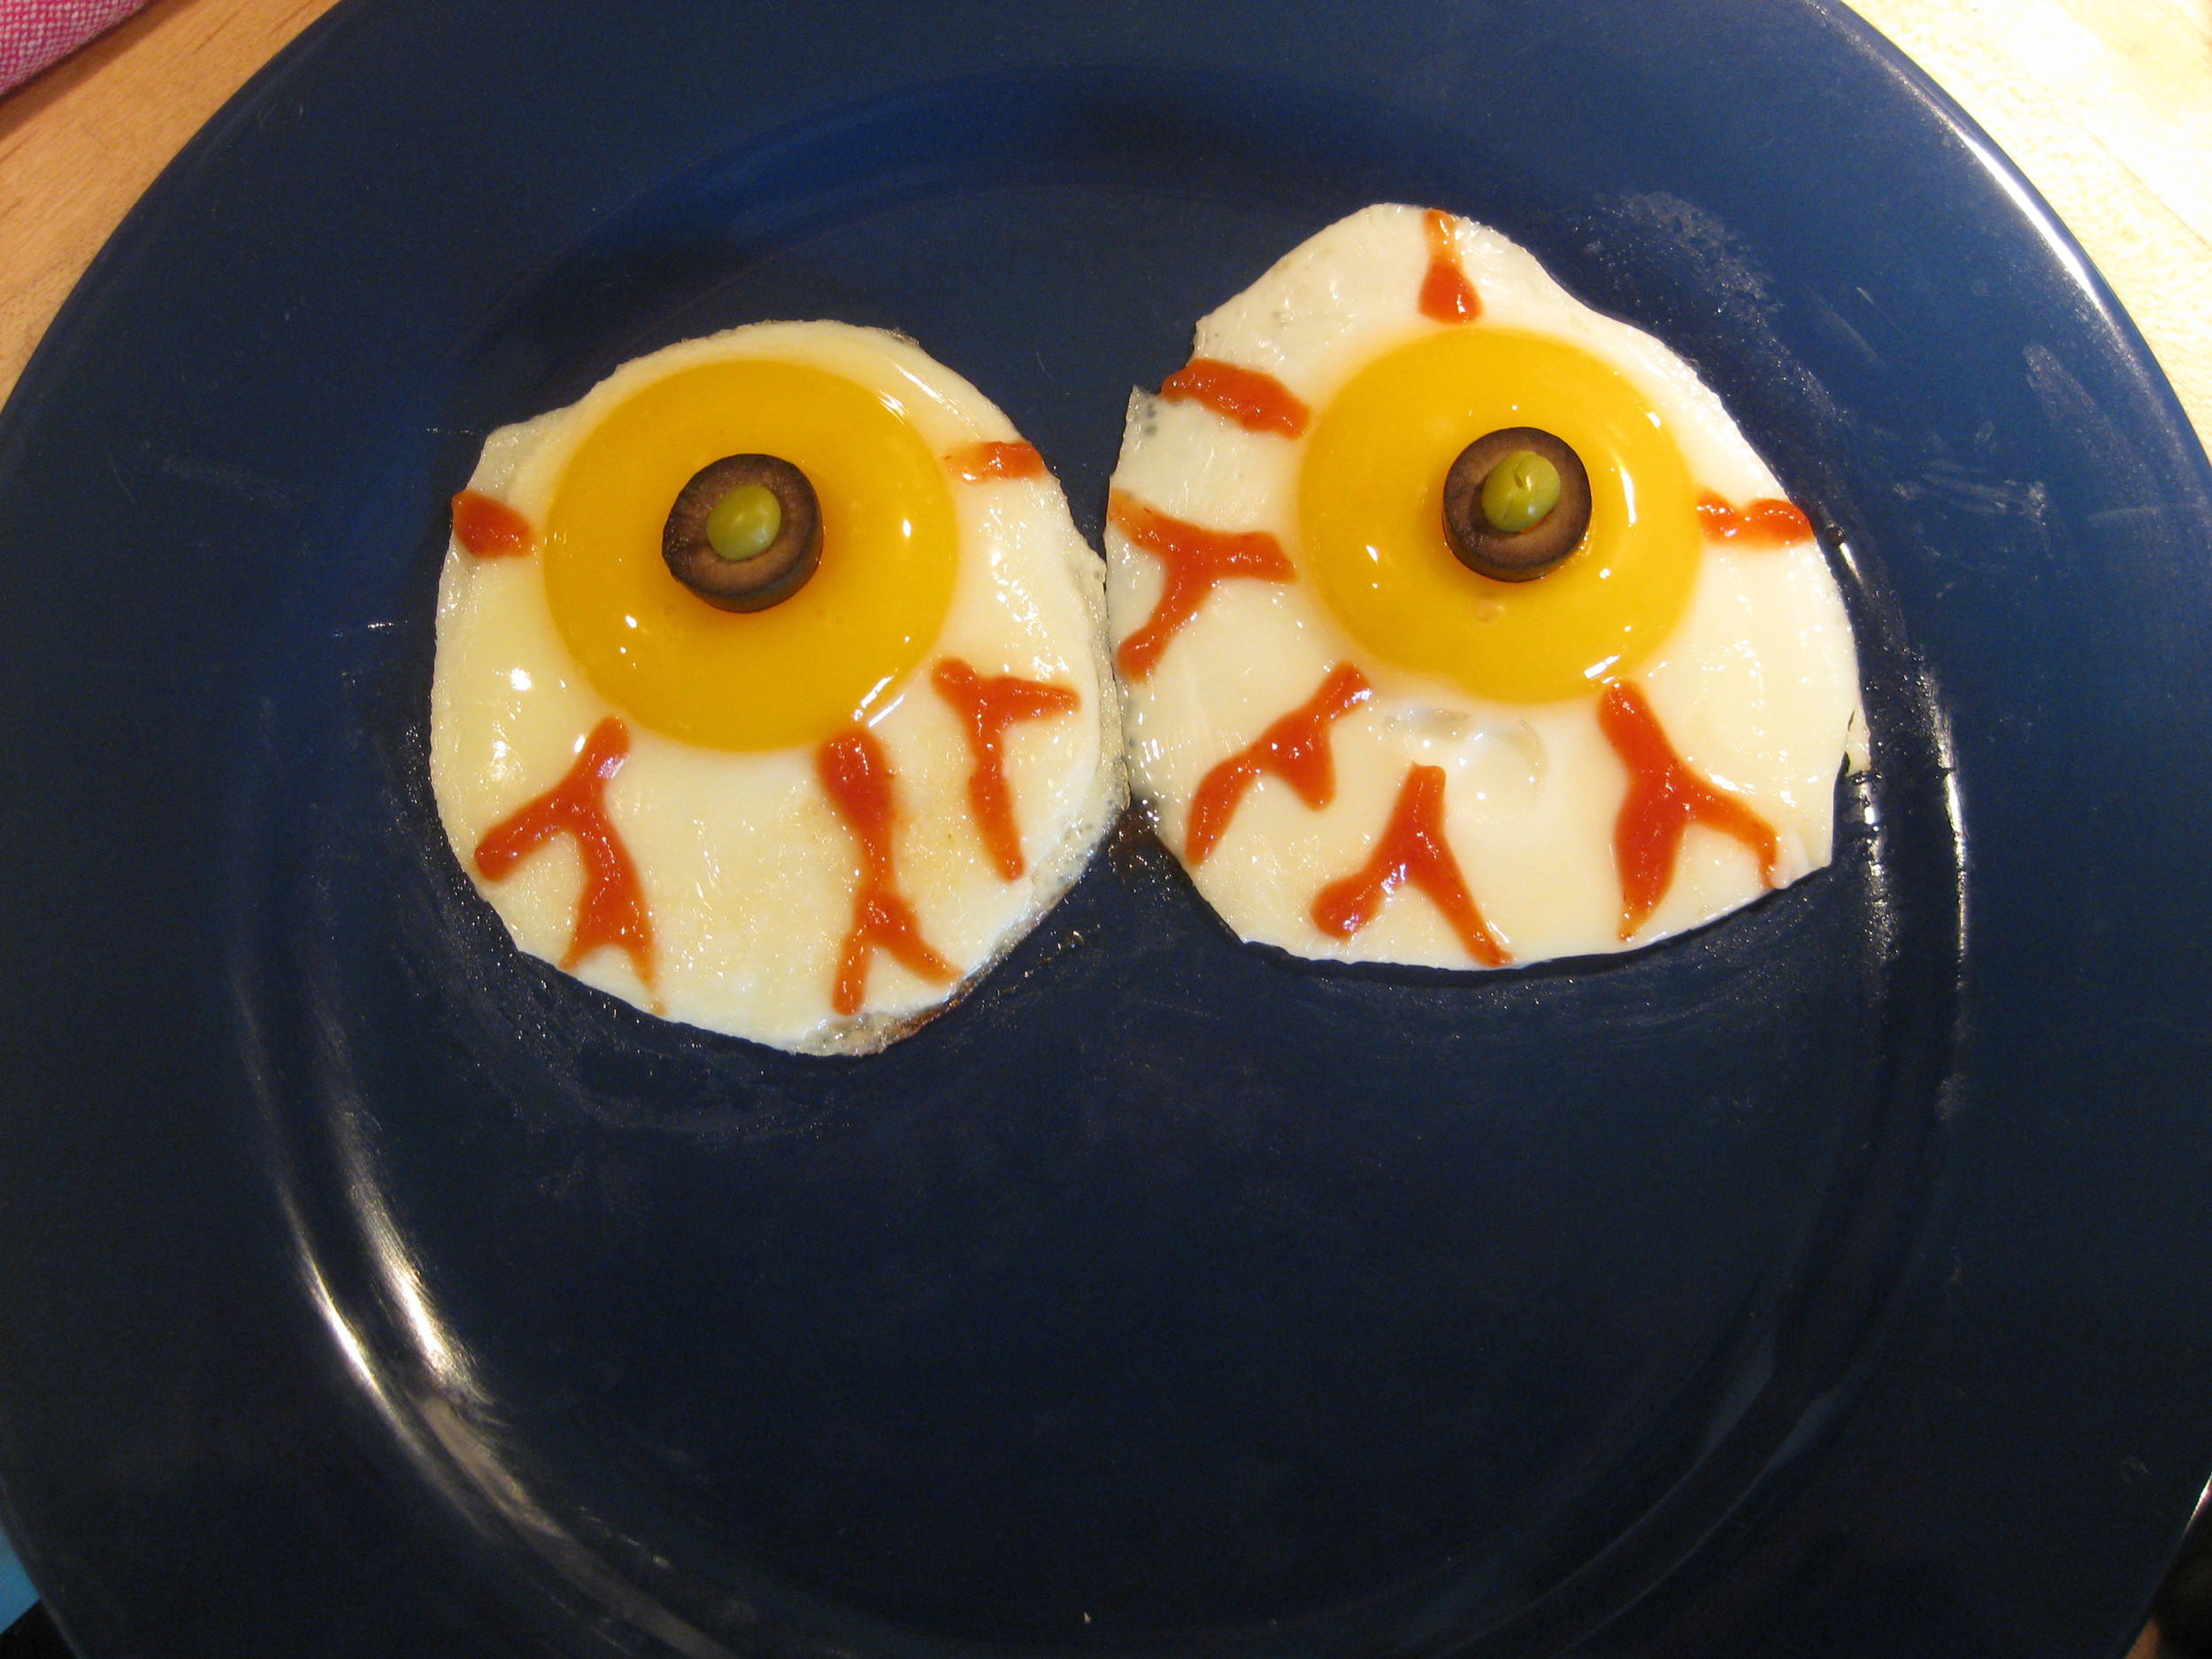 Creepy Breakfast!